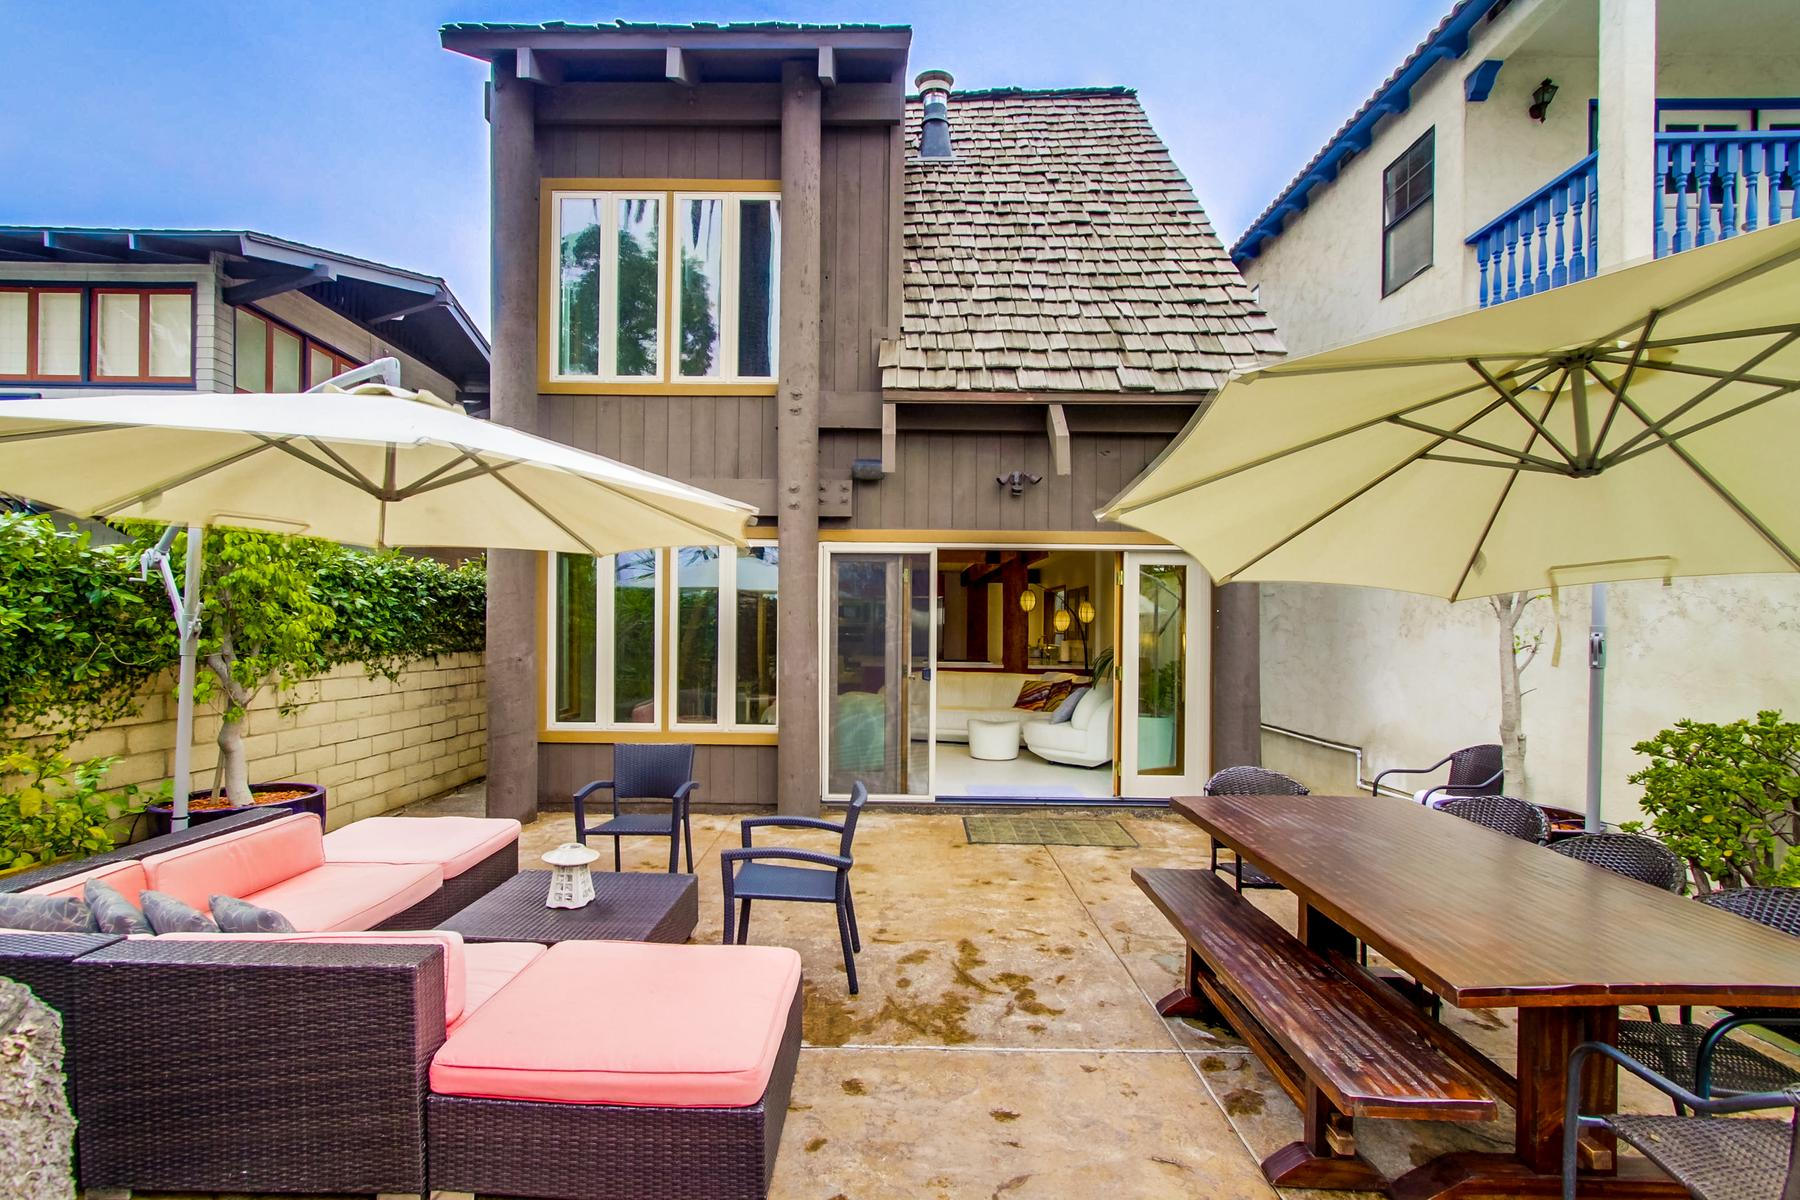 Single Family Home for Sale at 315 Alameda Boulevard Coronado, California 92118 United States